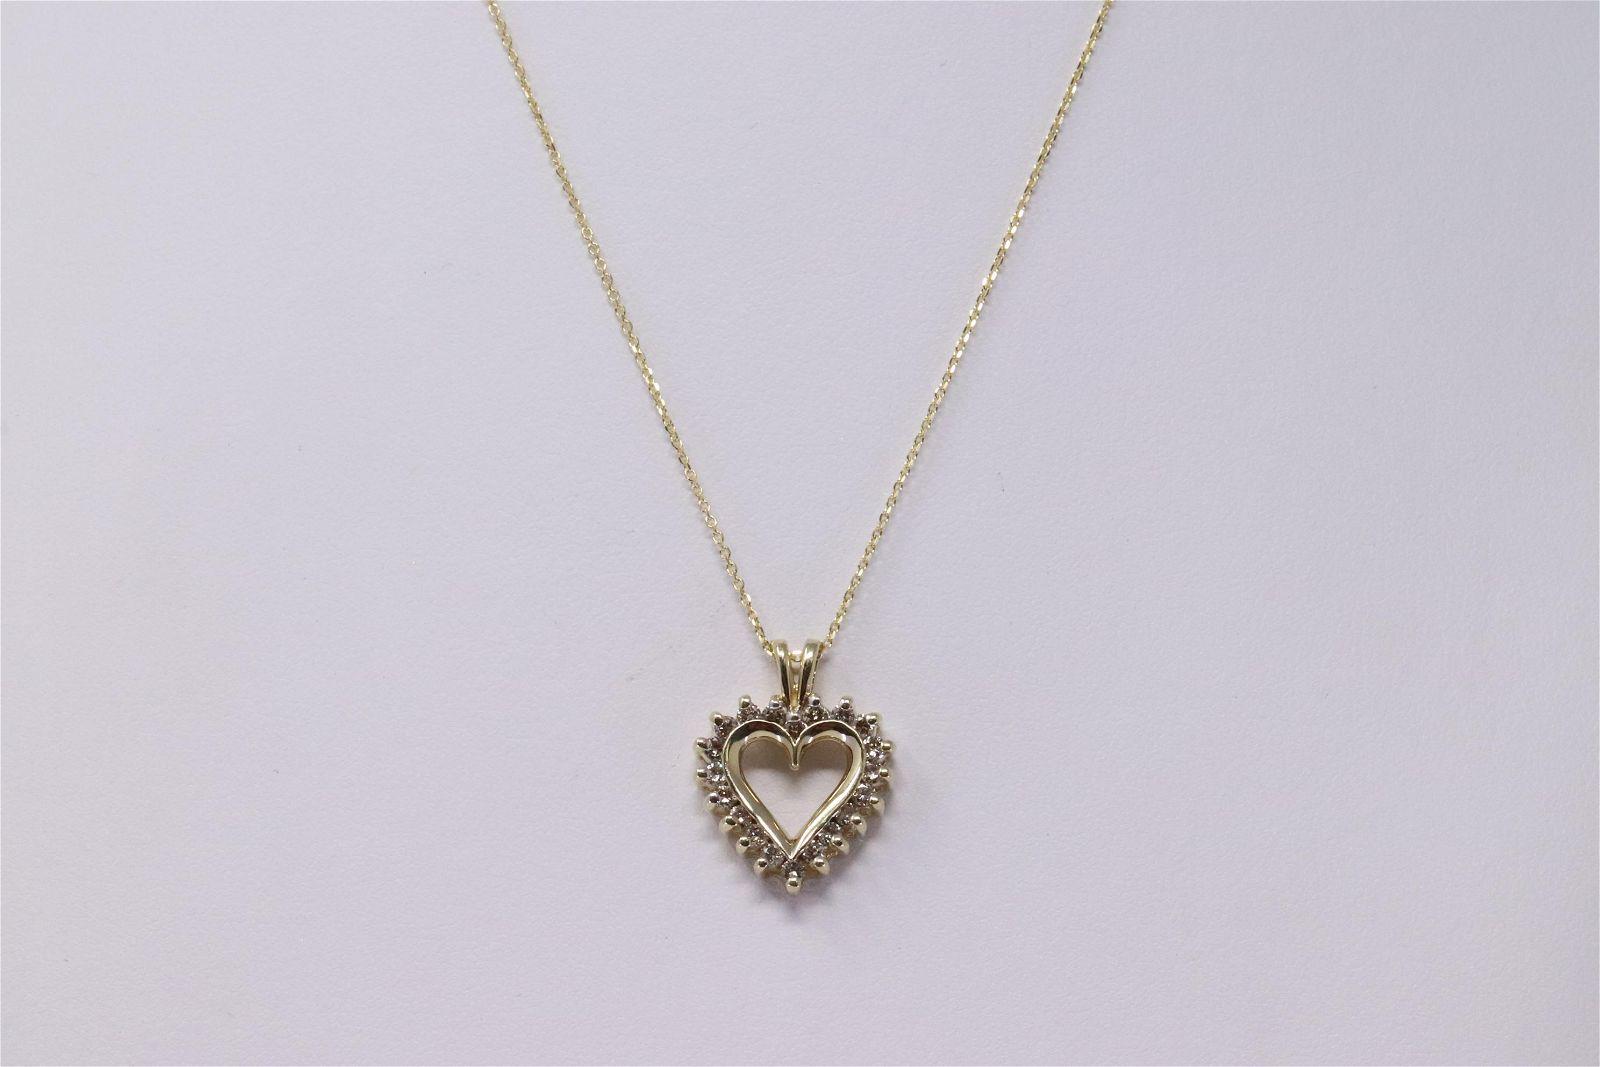 14KT Diamond Heart Pendant/14KT Necklace.